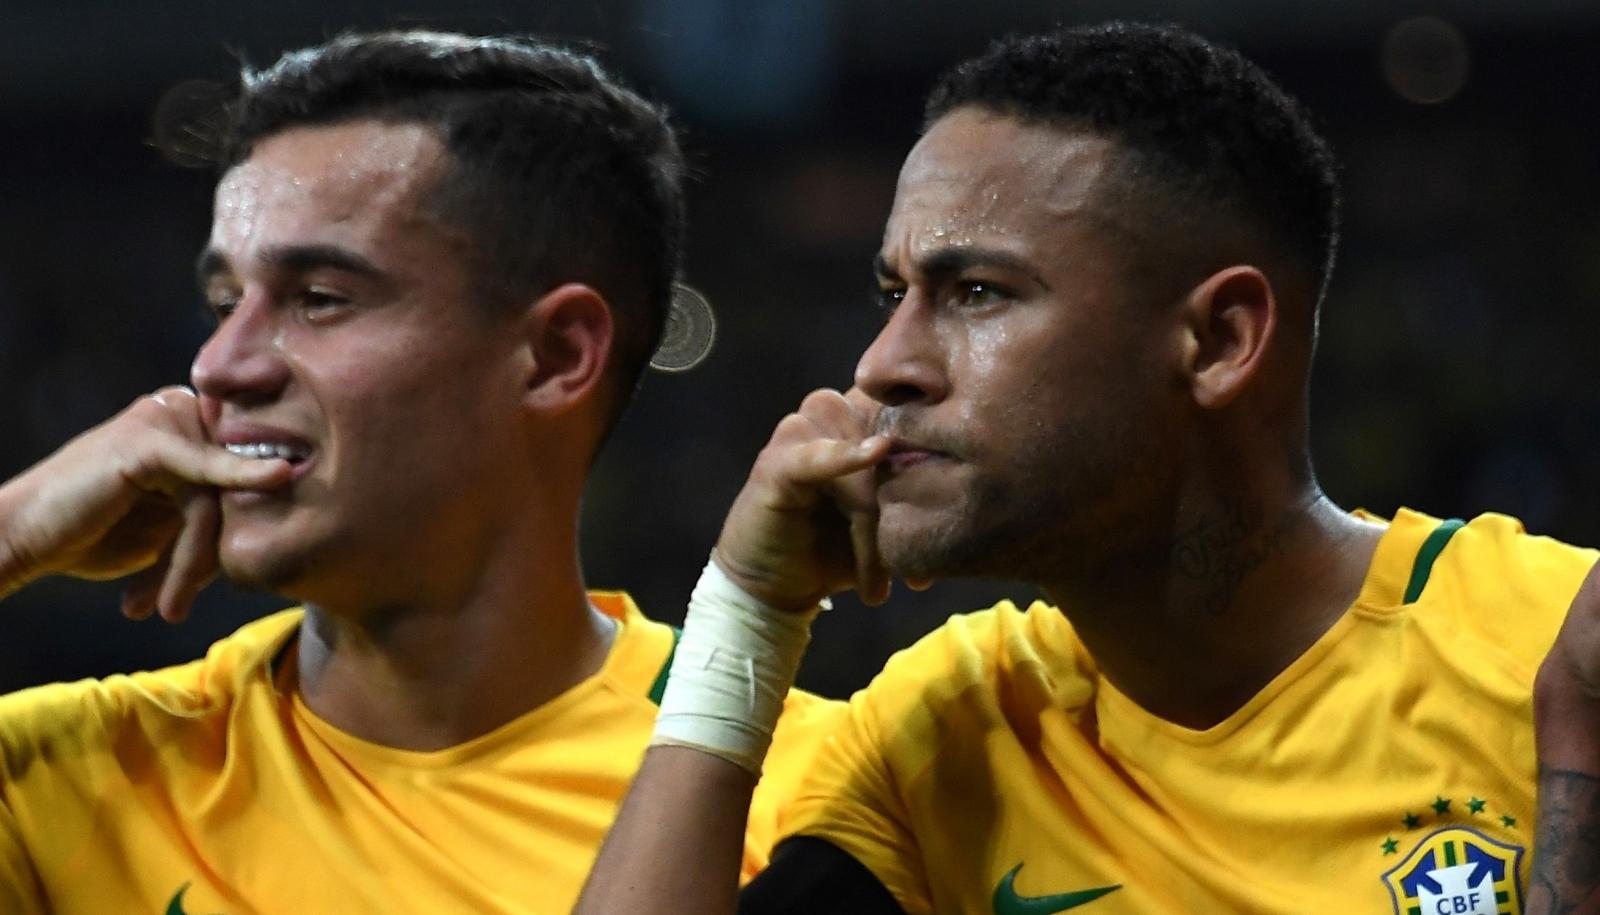 Alves scores on debut as PSG beat Monaco in Super Cup